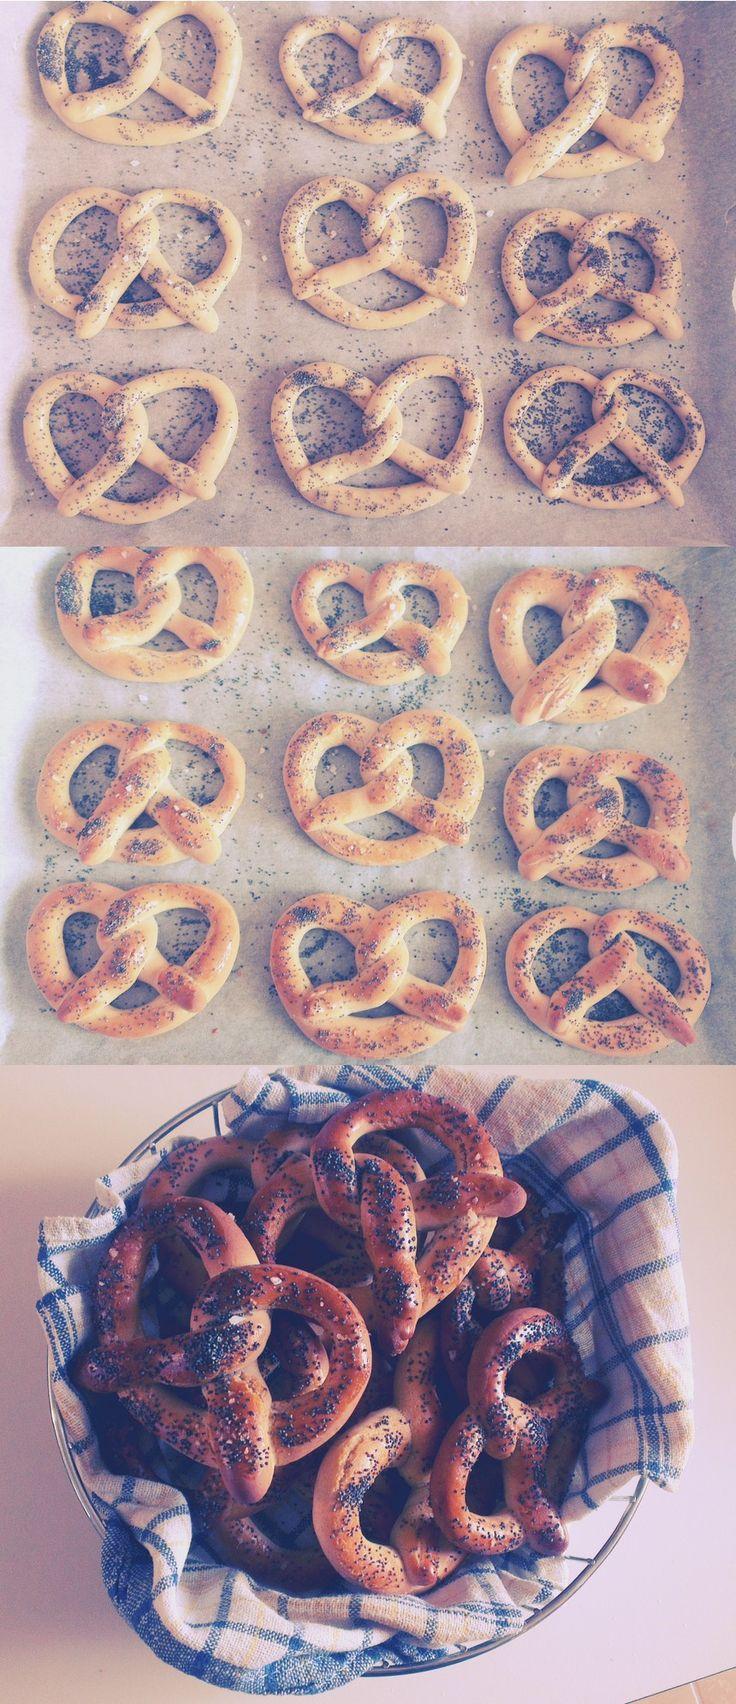 Rye pretzels with poppy seeds